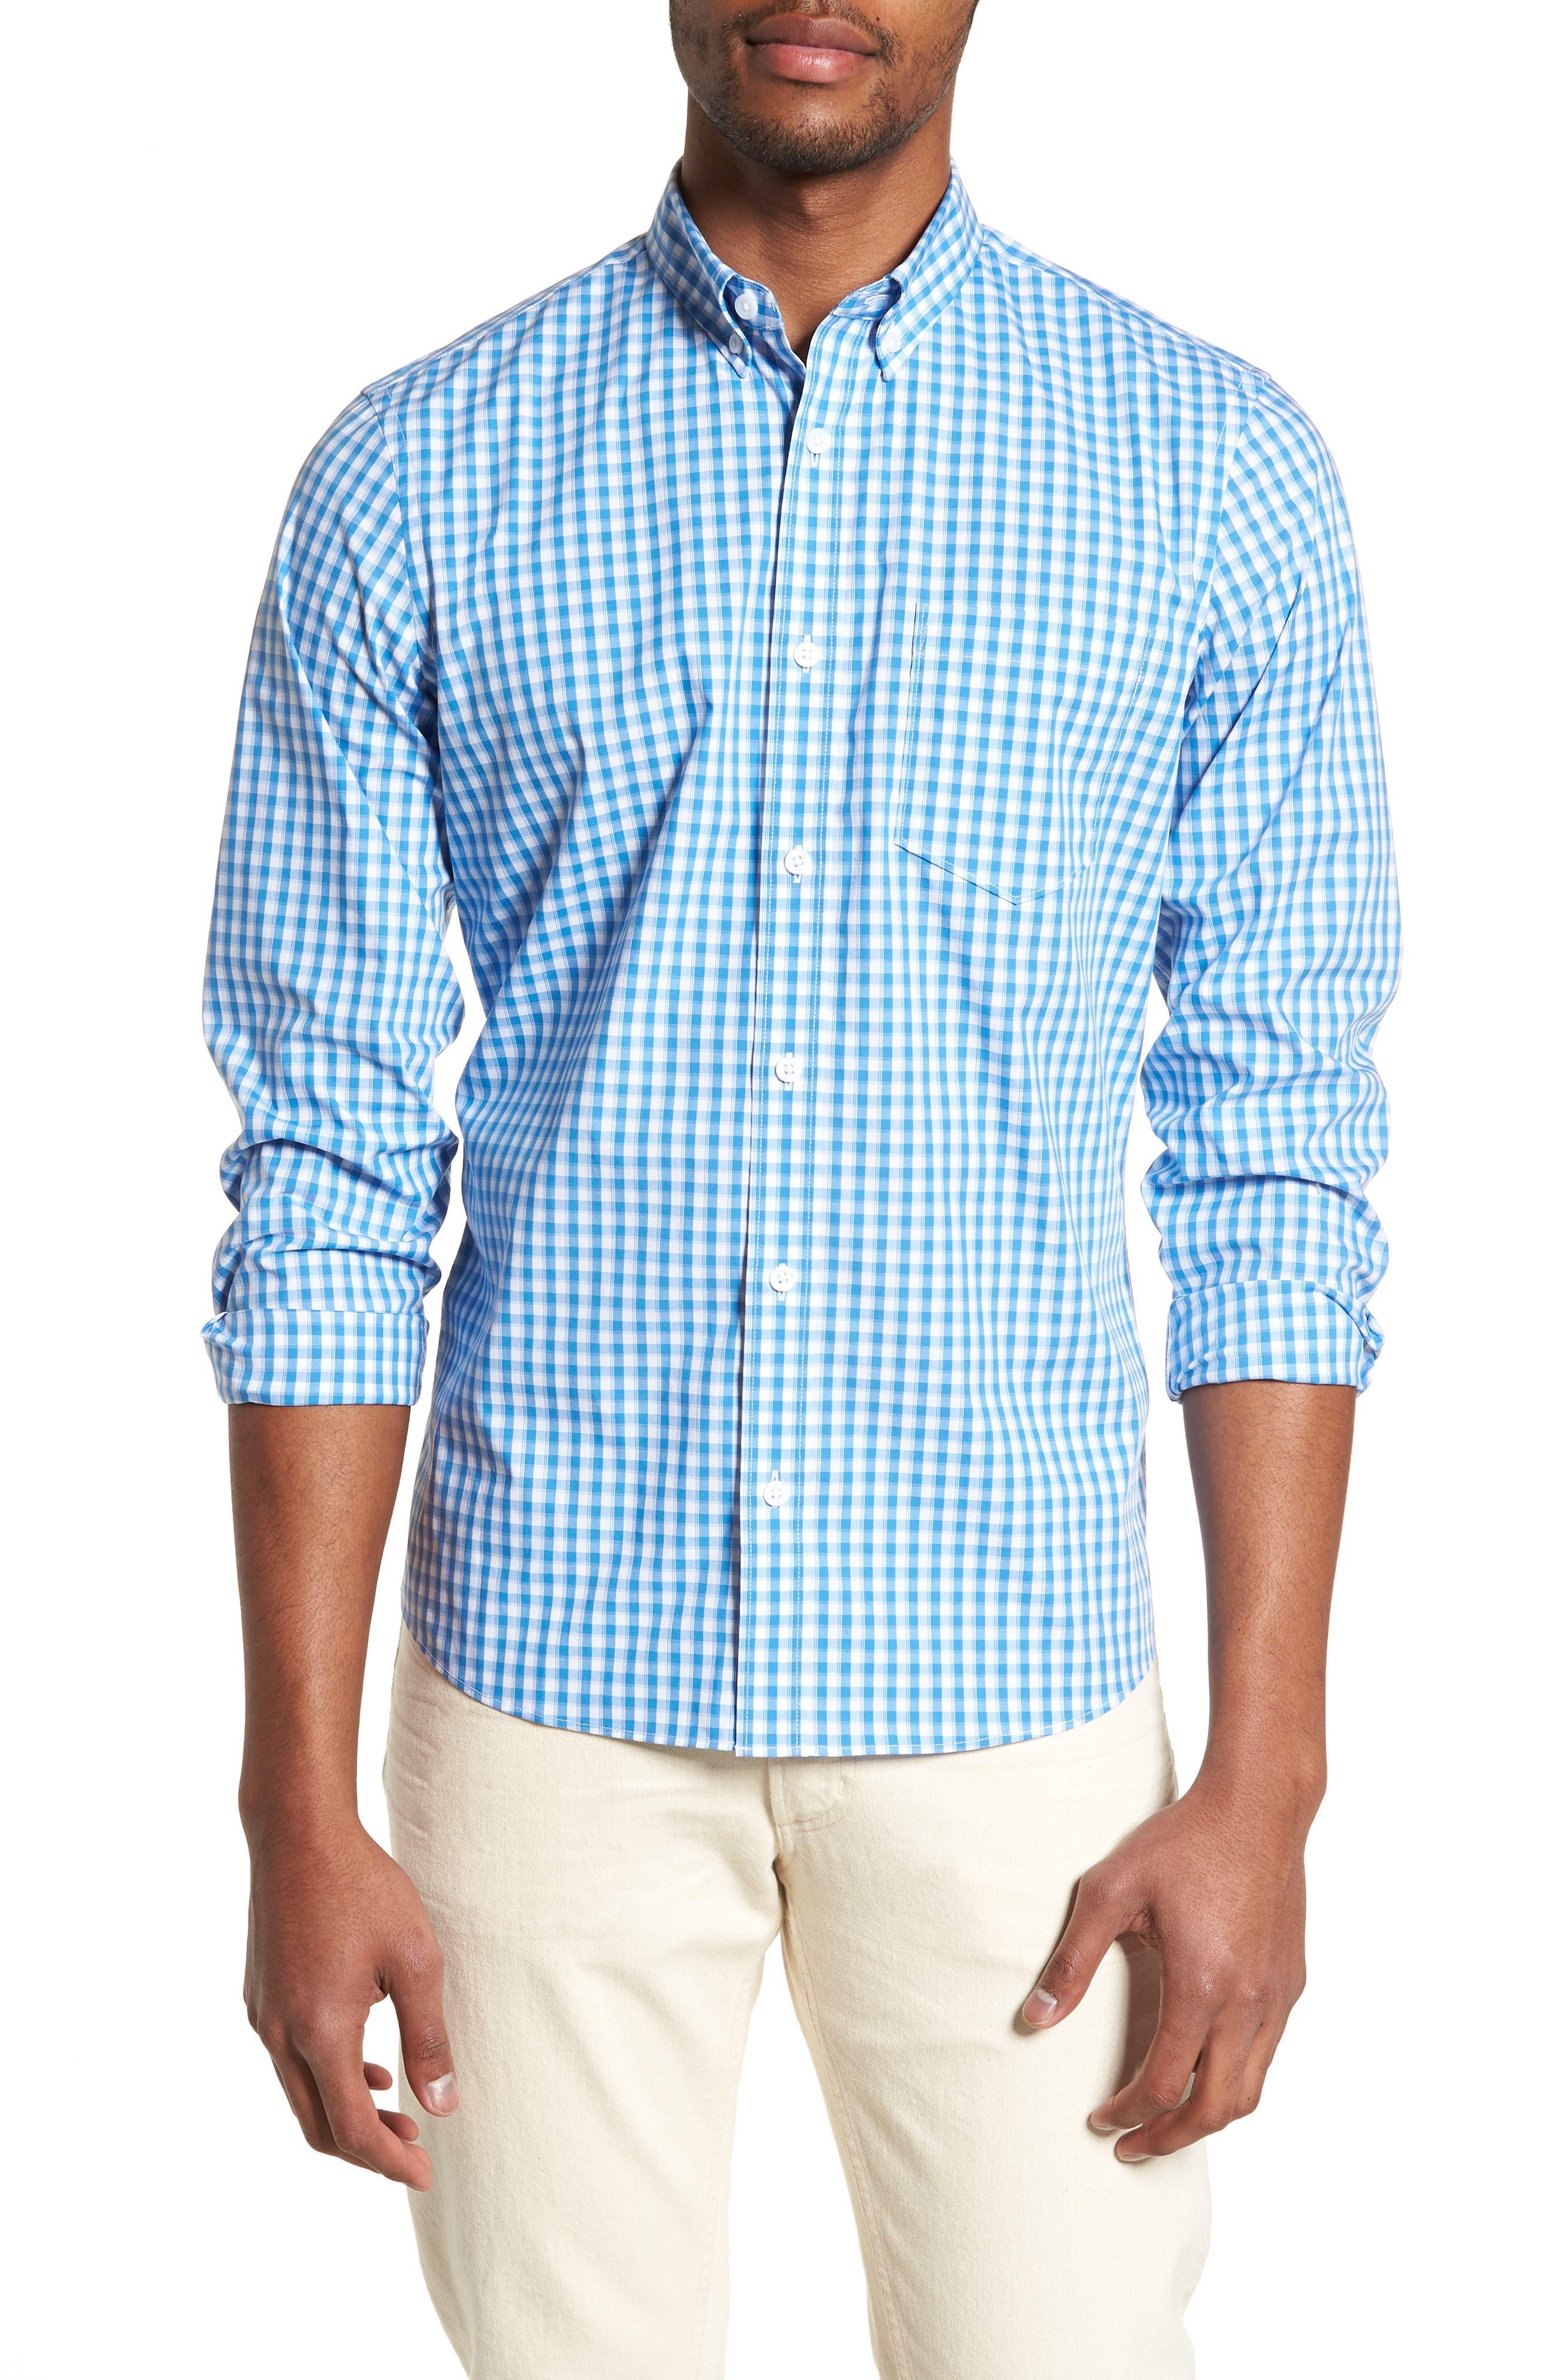 Tech-Smart Trim Fit Check Sport Shirt,                             Main thumbnail 1, color,                             Blue Camp White Gingham